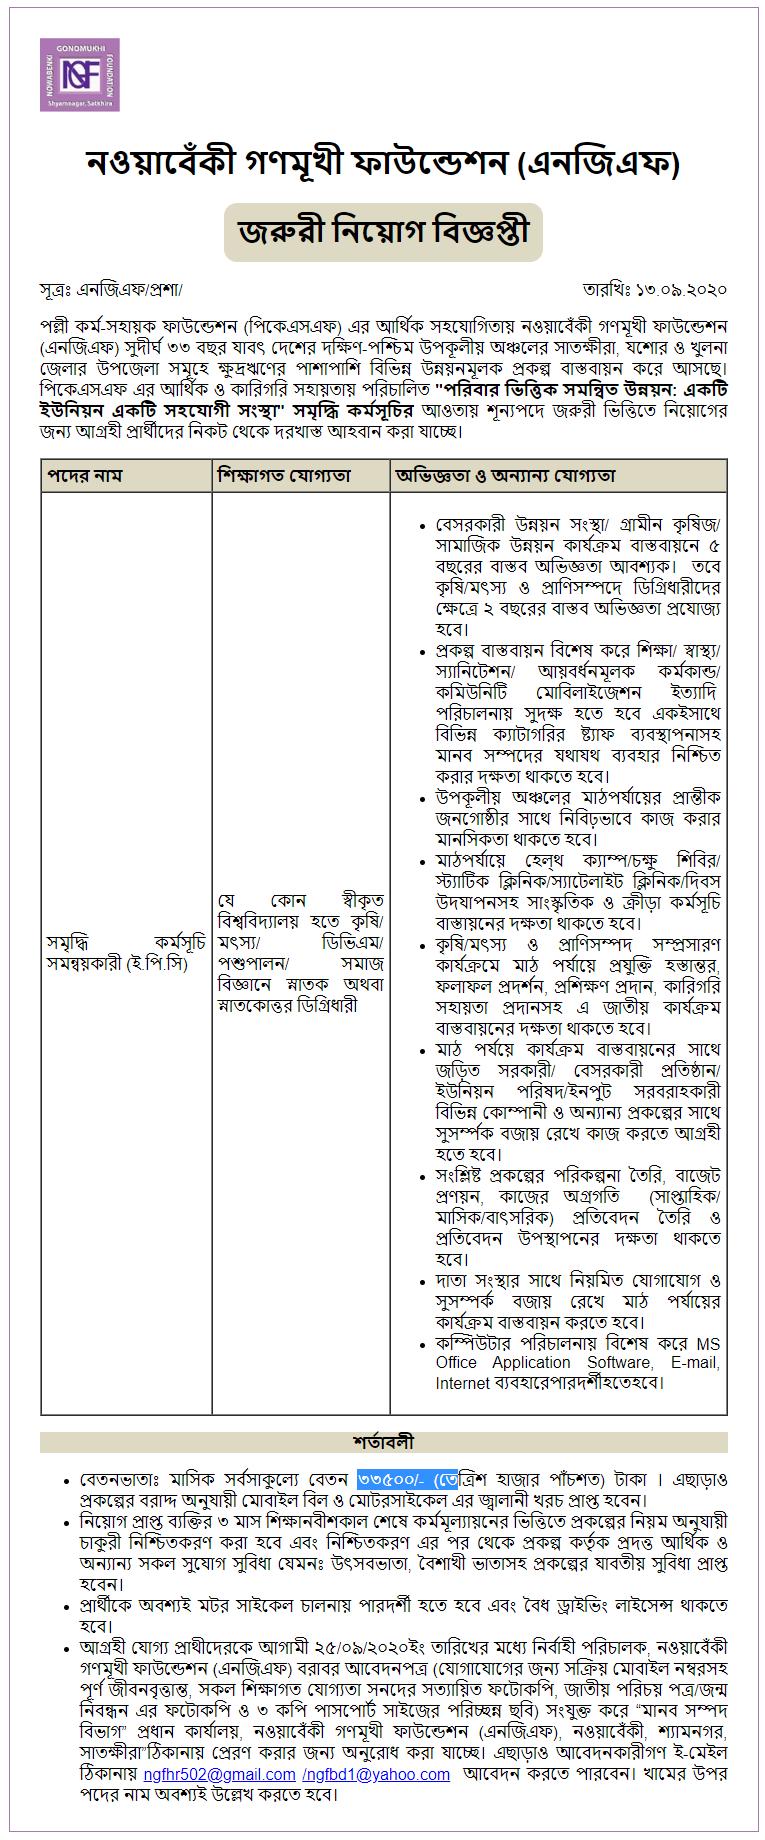 Nowabenki Gonomukhi Foundation